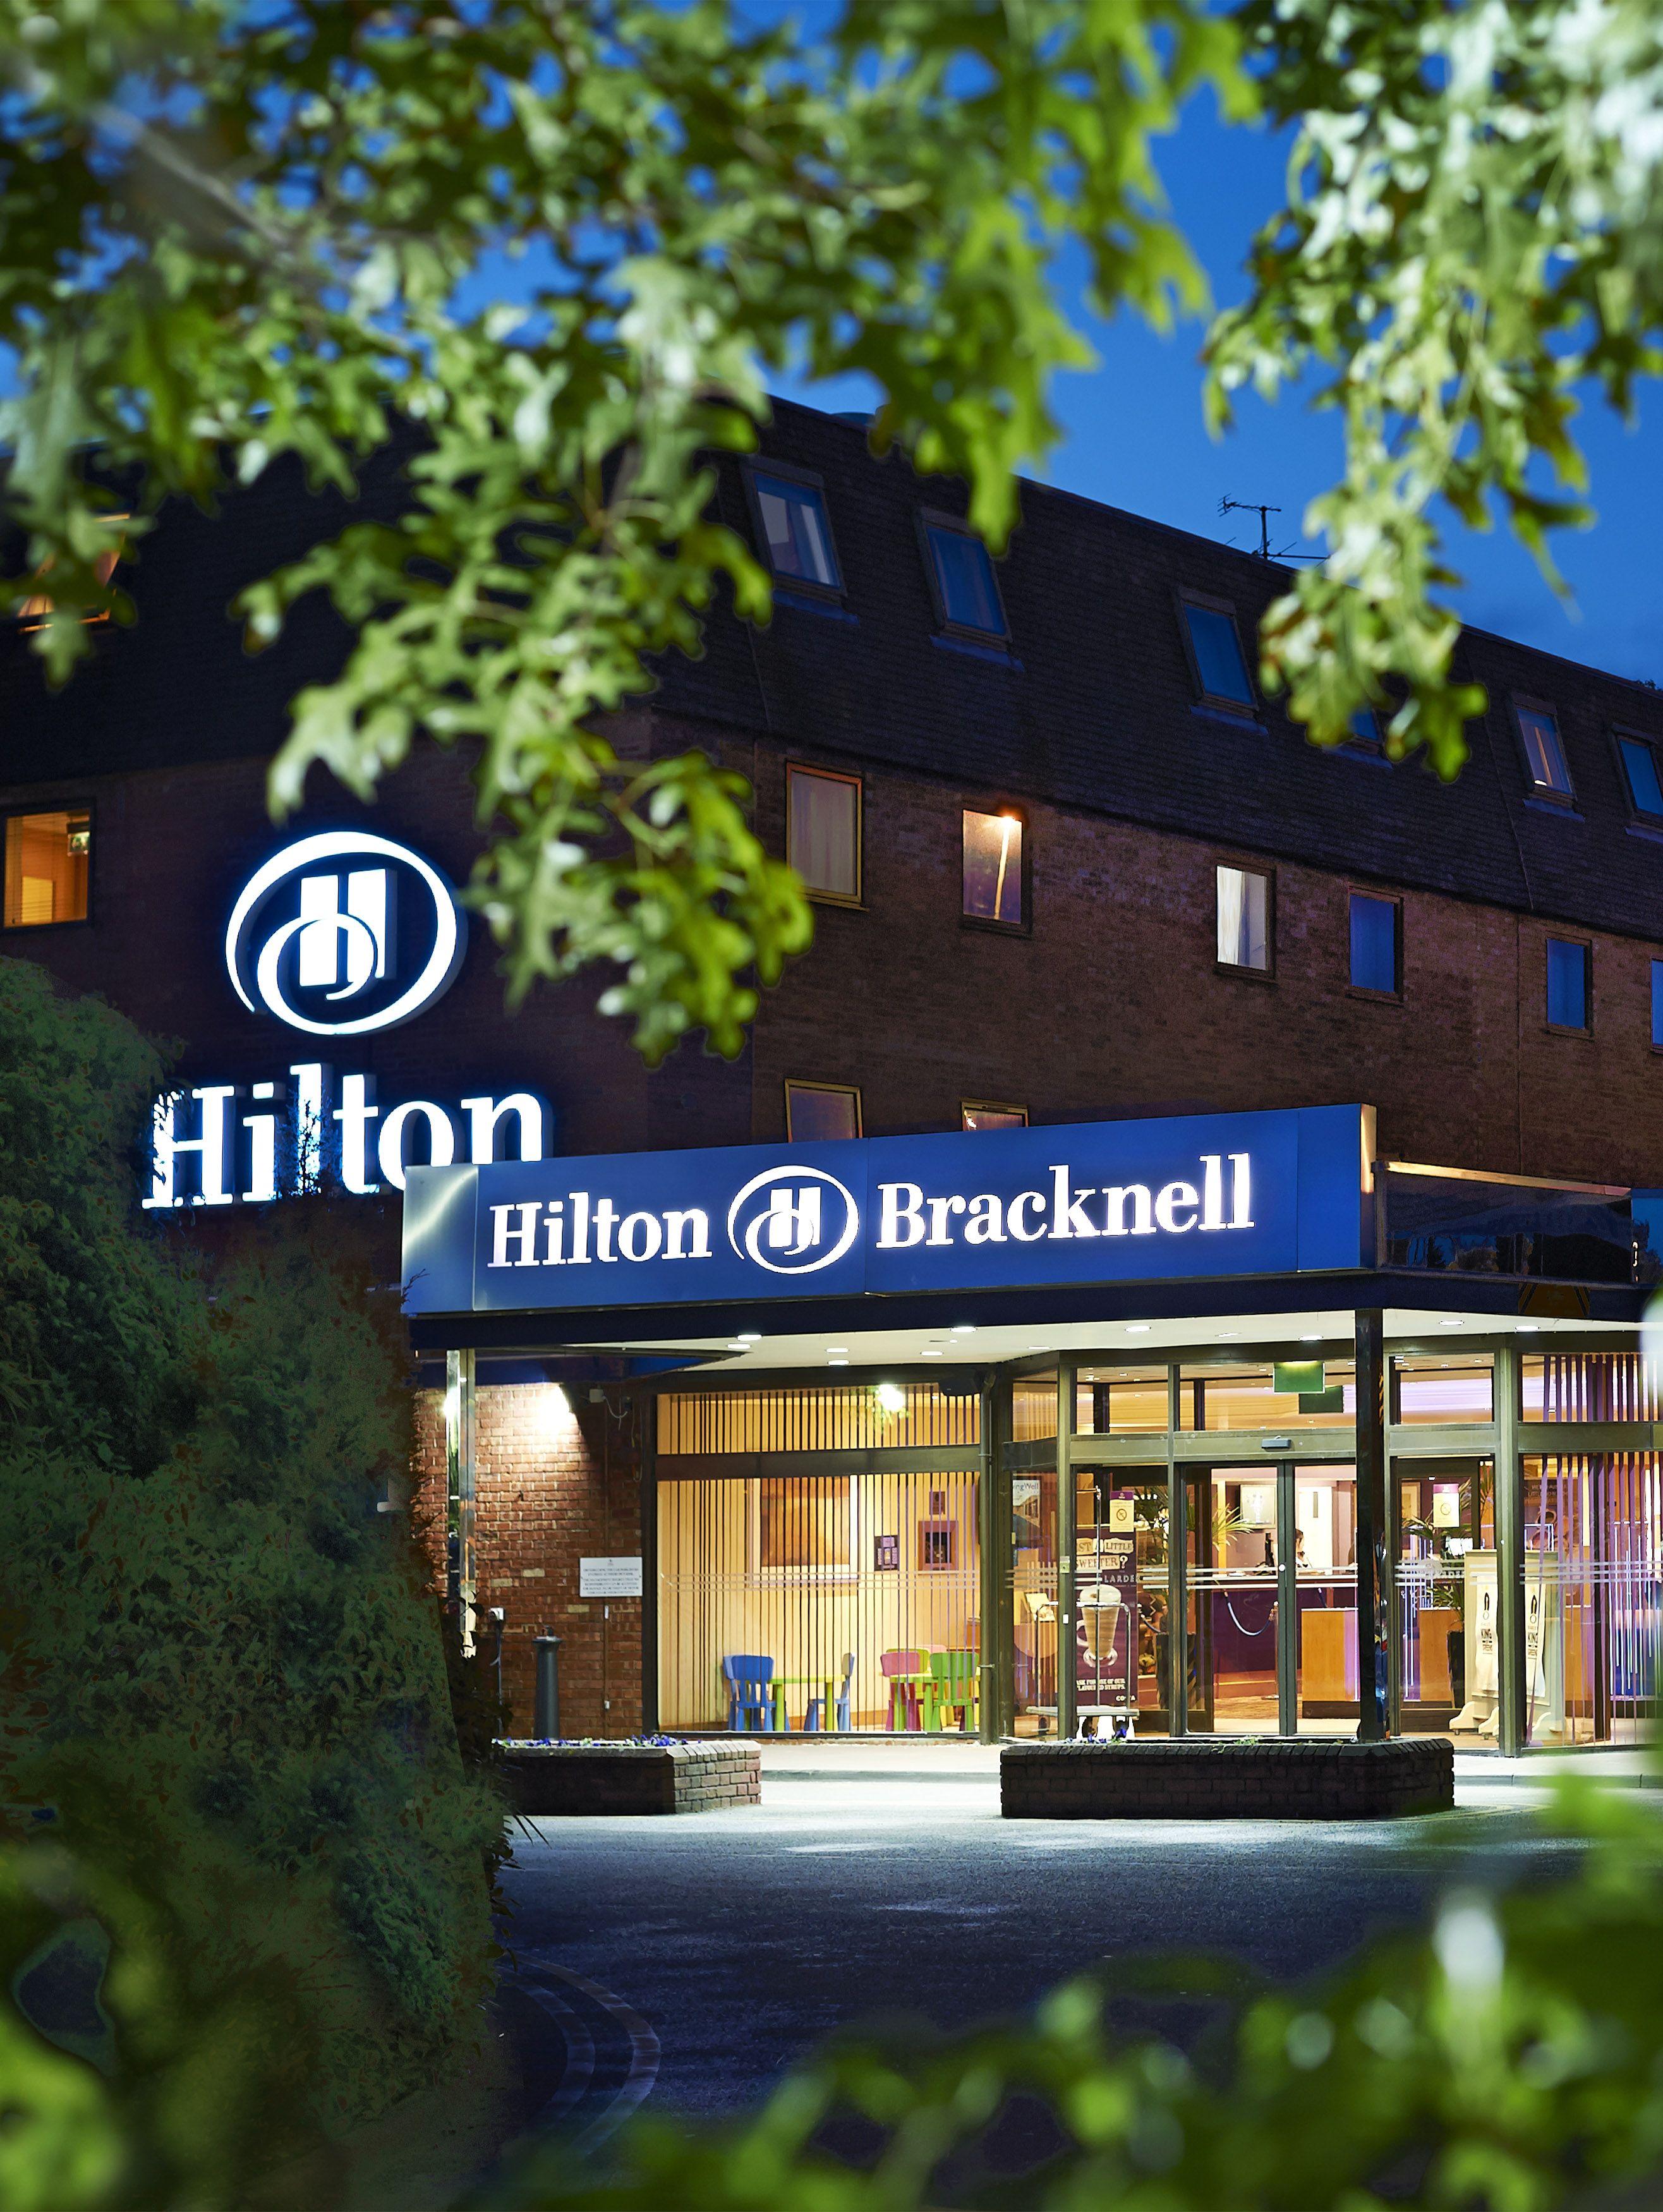 Hilton Bracknell Hotel Hilton Hotel Windsor Castle